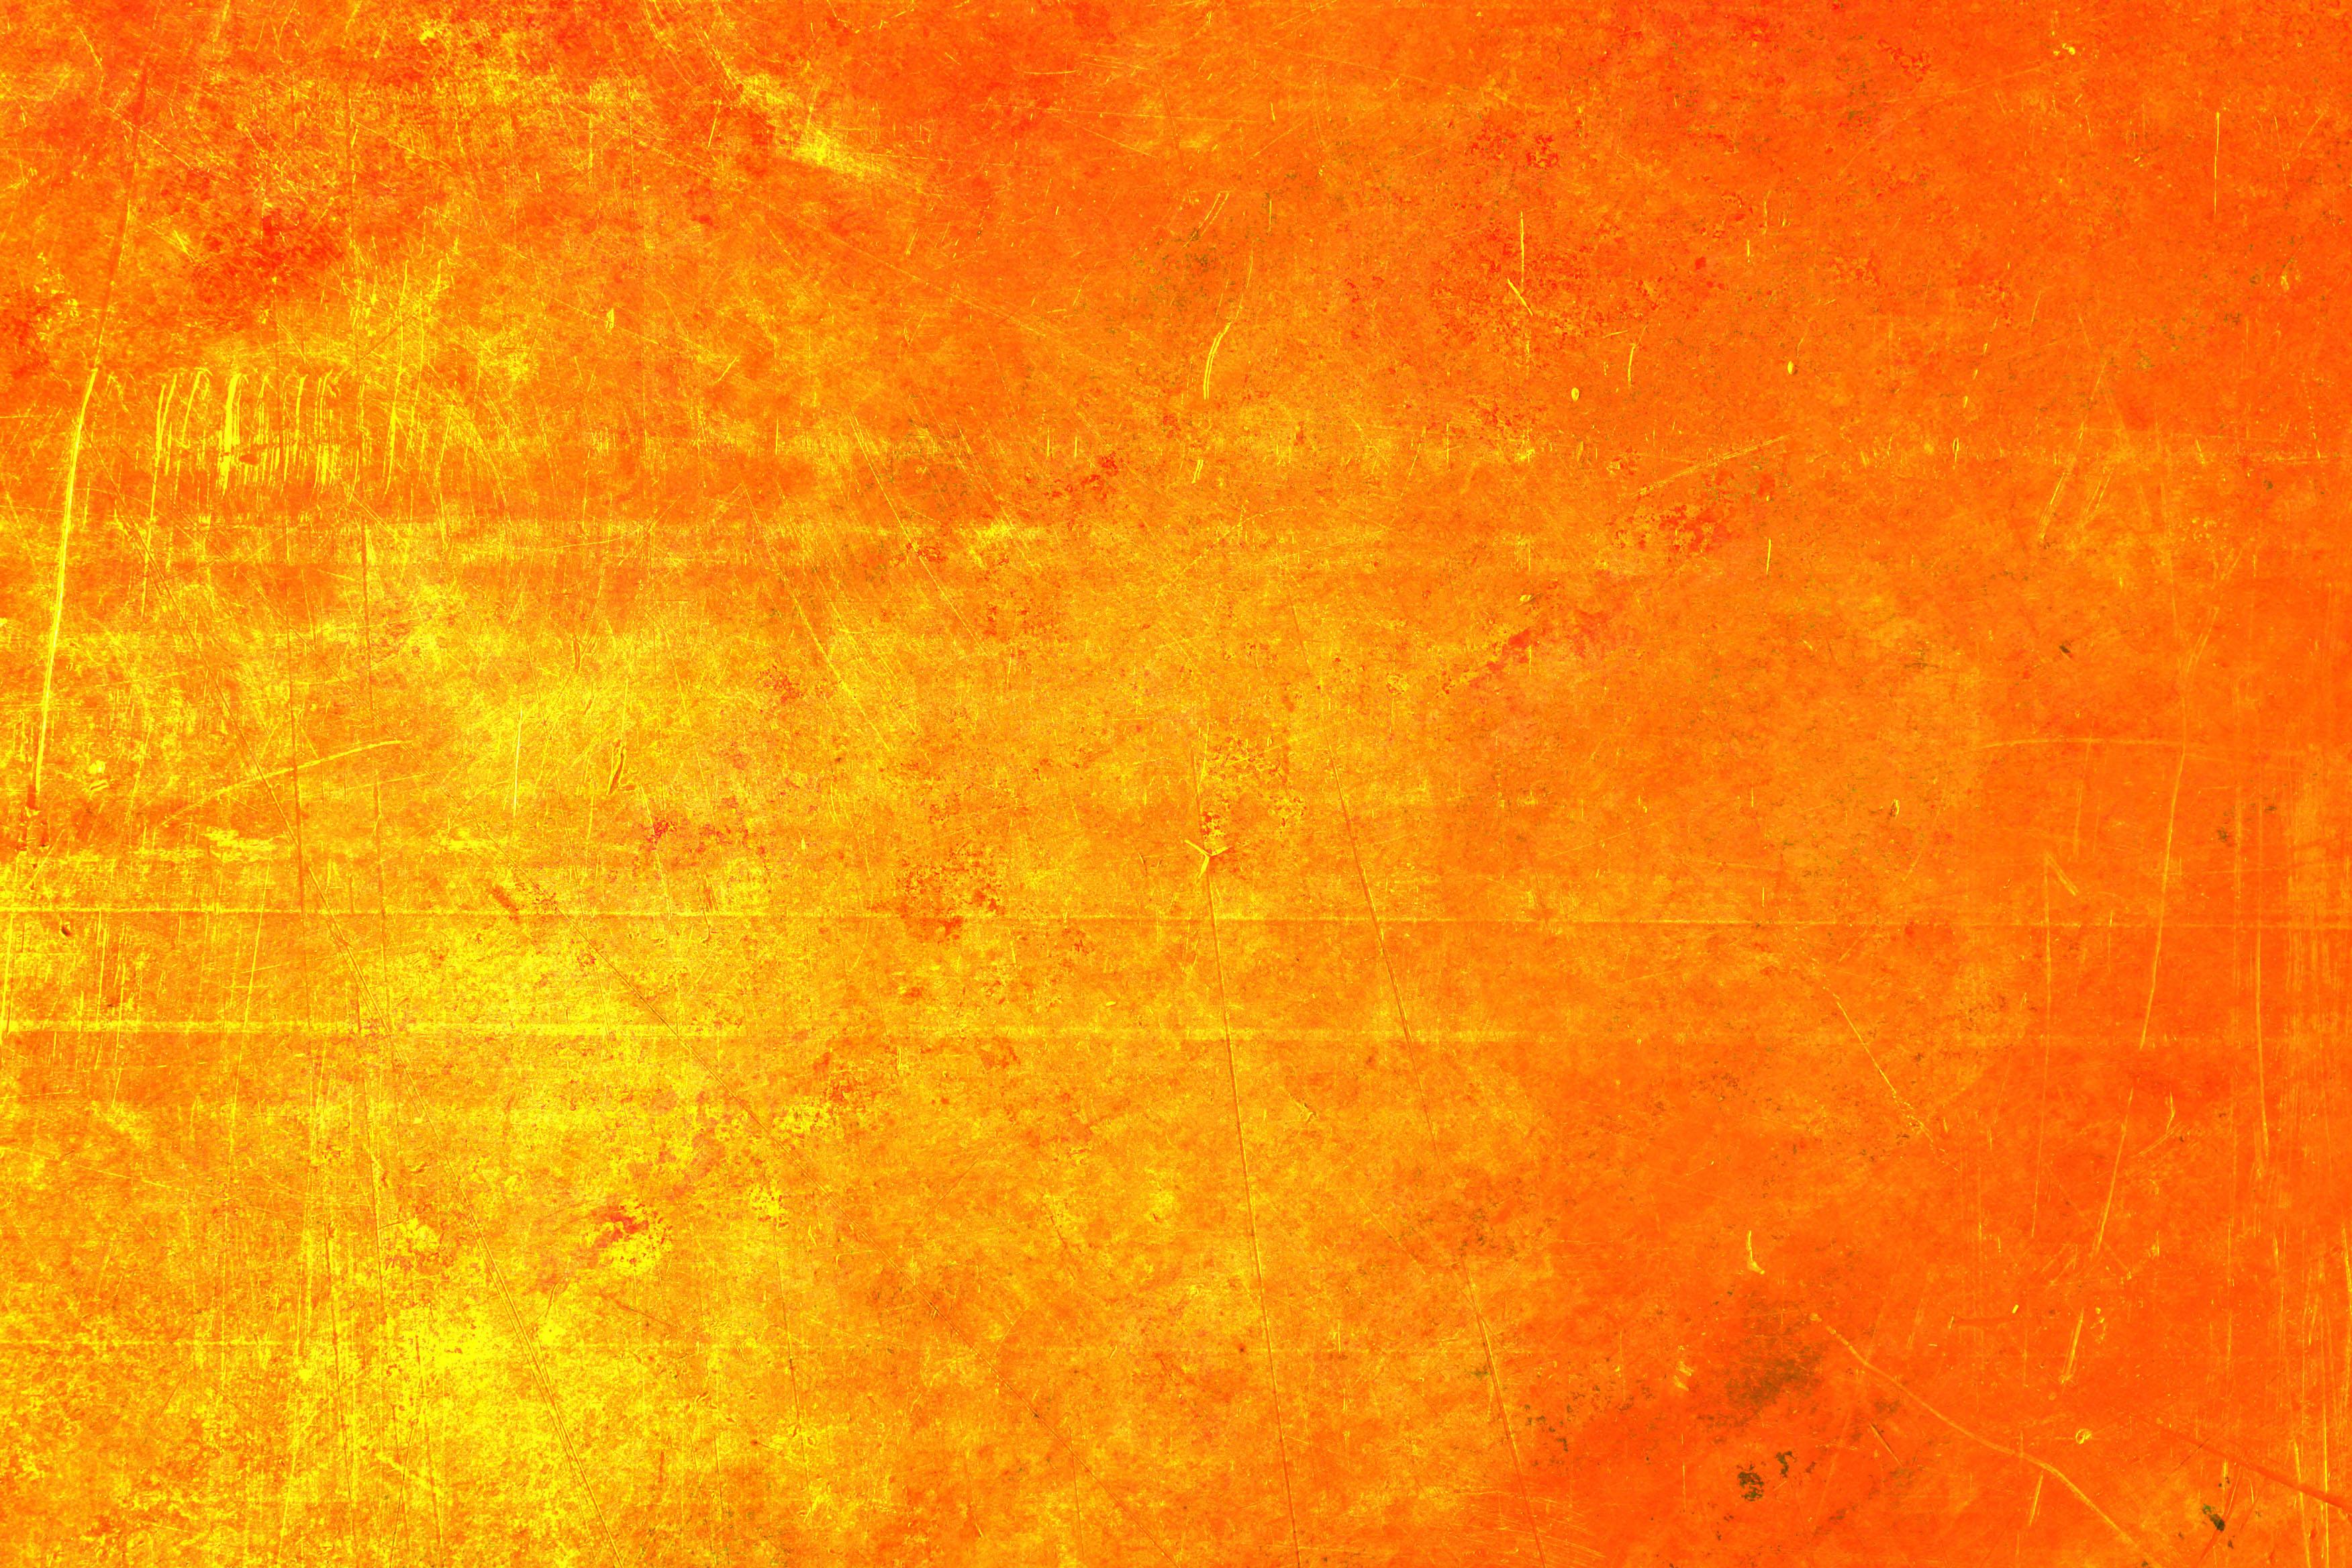 Orange Metallic Paint For Walls